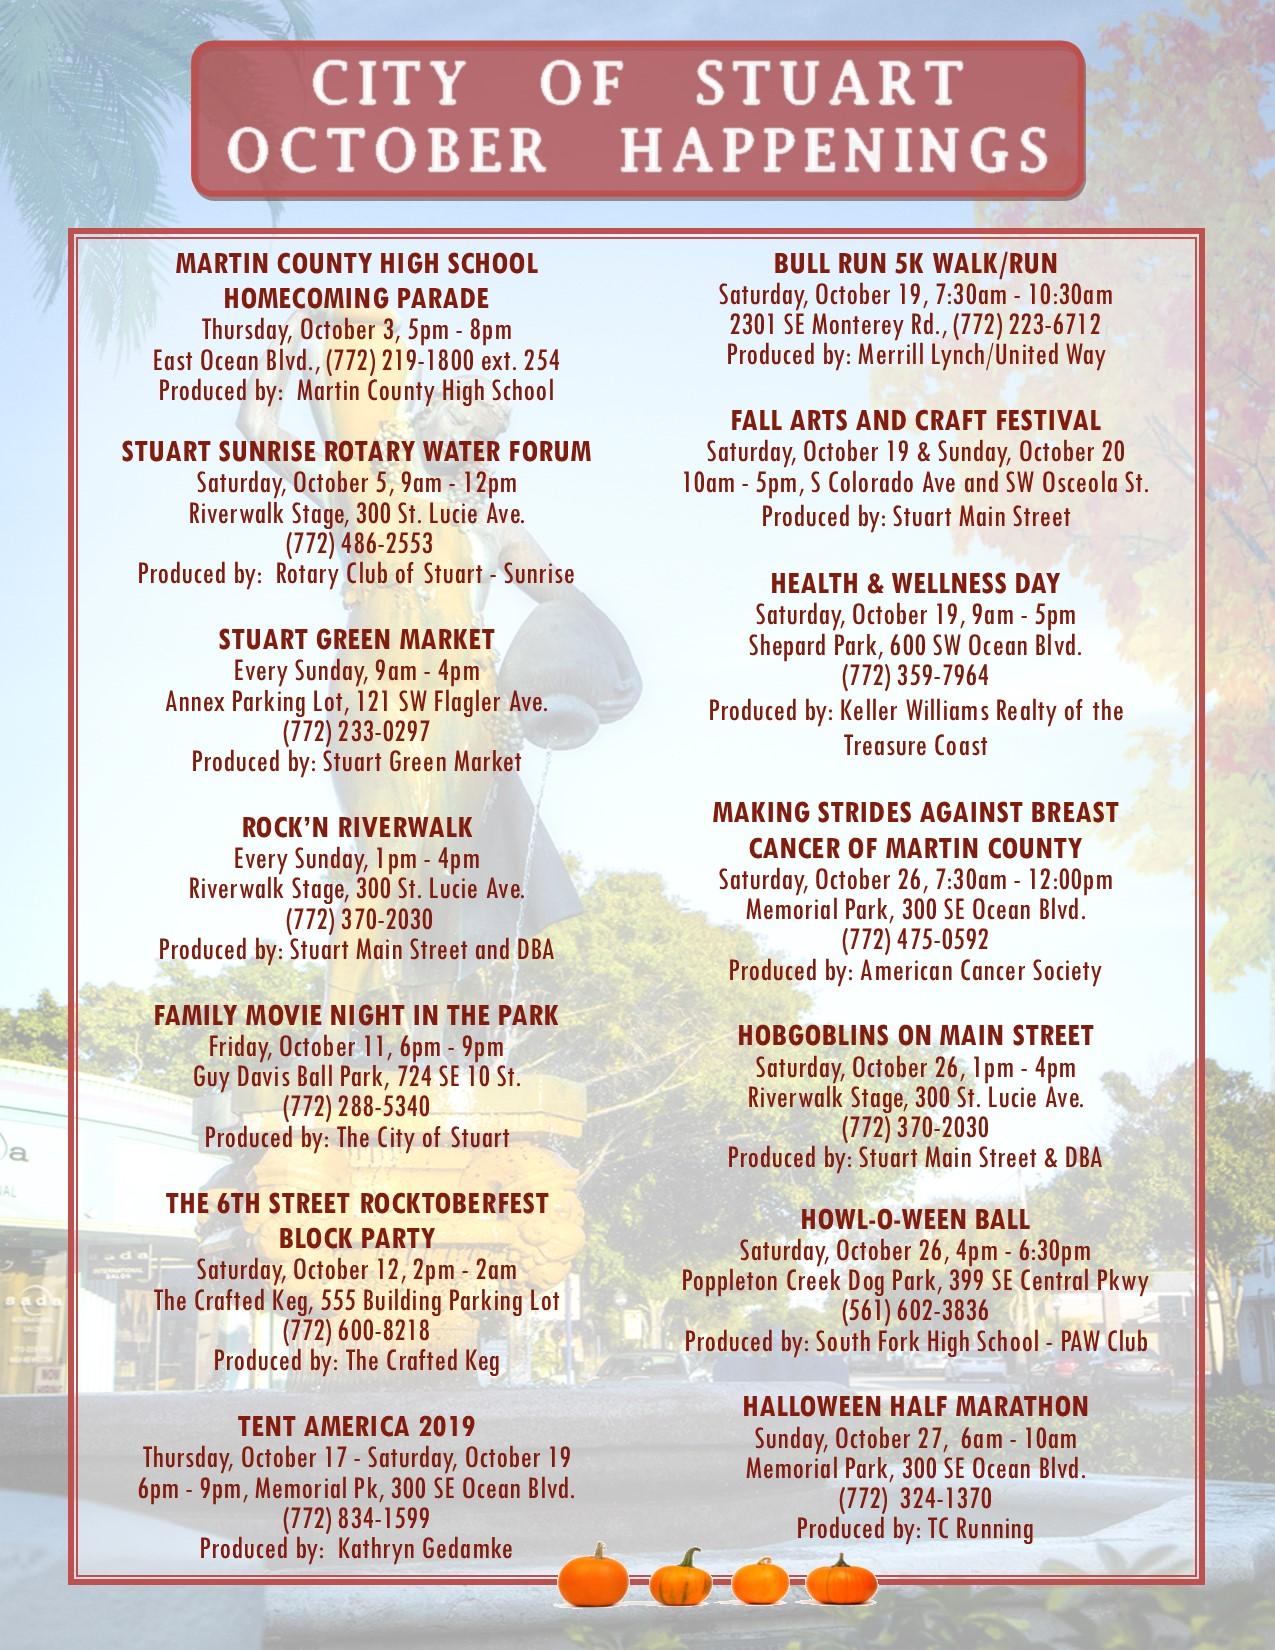 Lynch Park Halloween 2020 City of Stuart October Happenings | Martin County